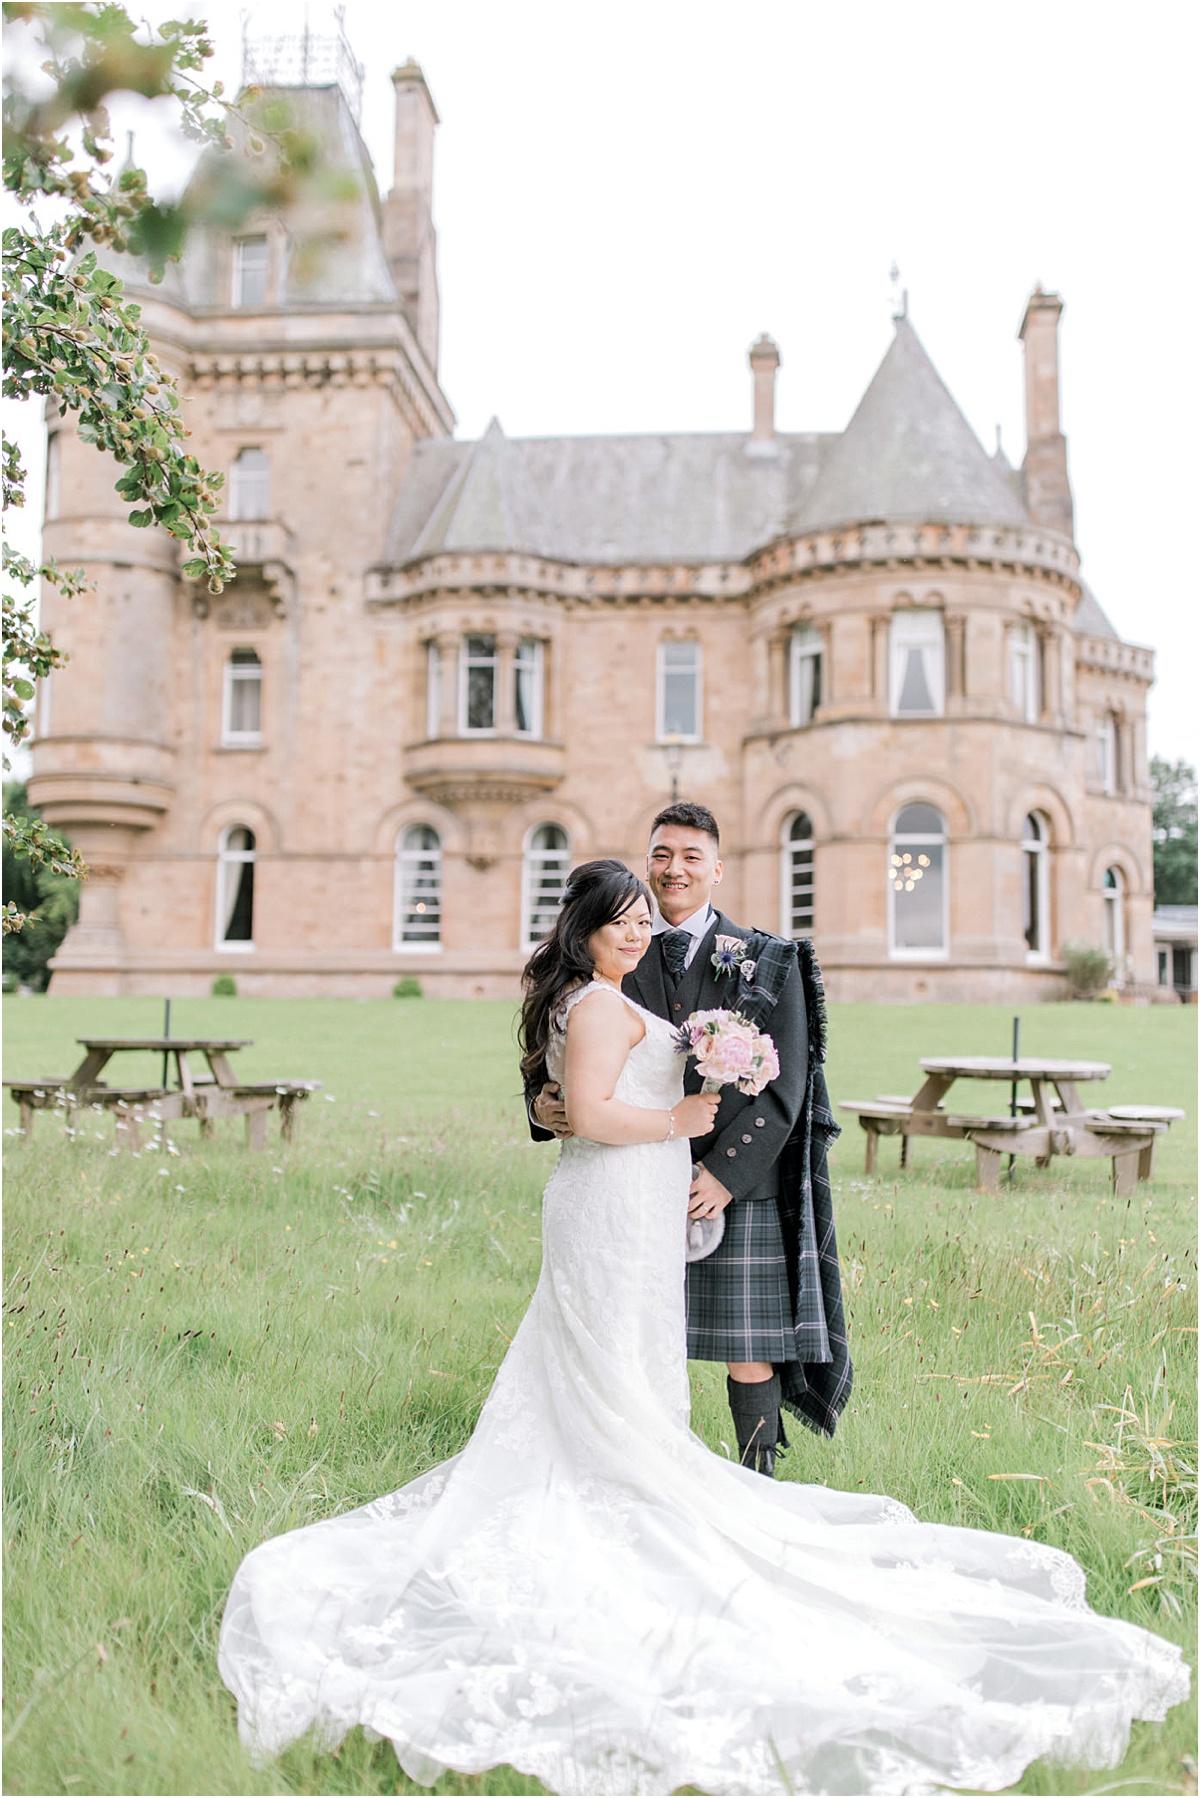 Cornhill Castle Wedding 0037.jpg